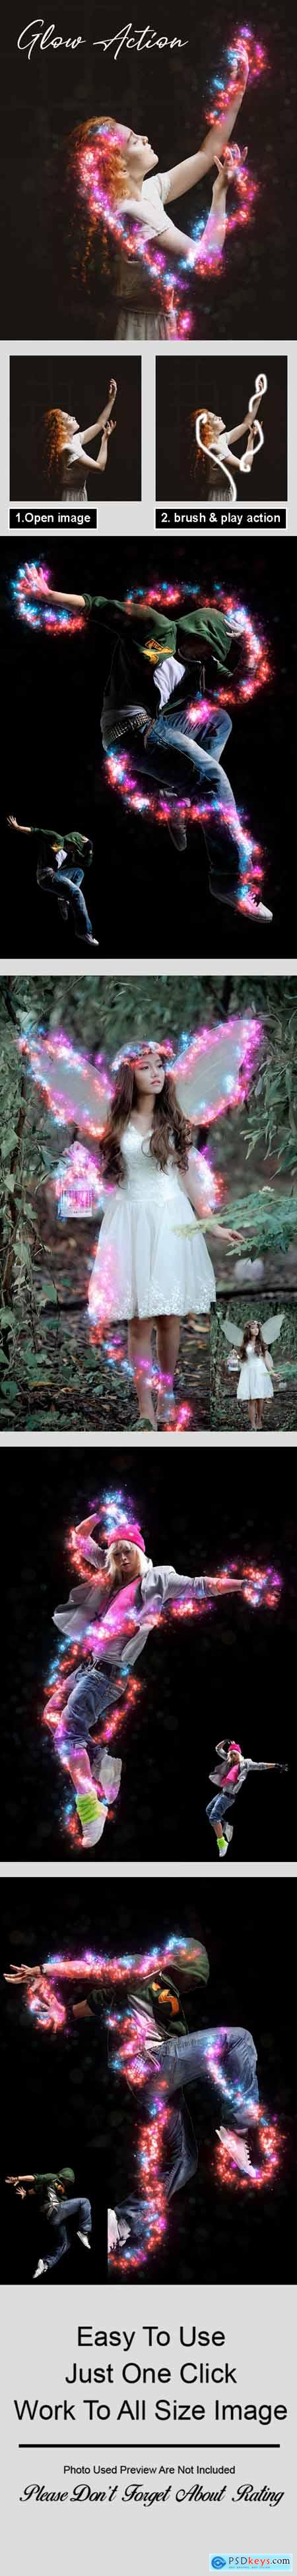 Glow Photoshop Action Vol 2 29783116